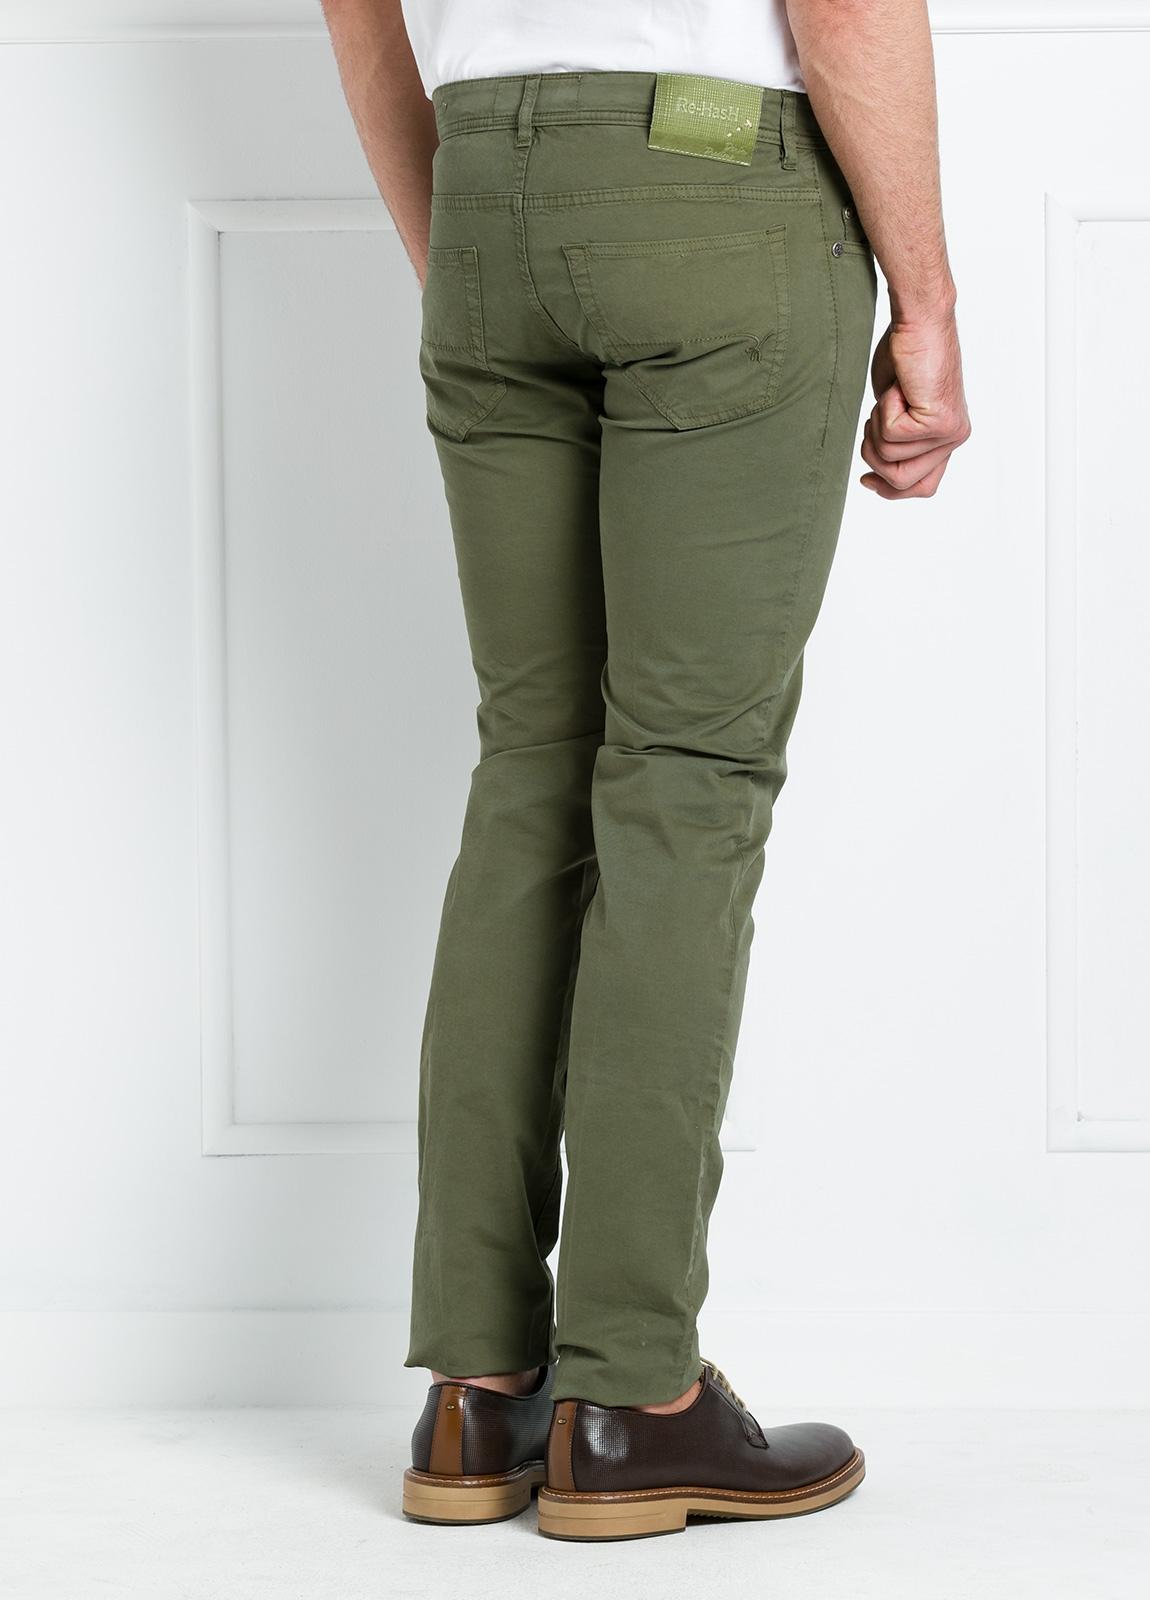 Pantalón sport regular fit modelo POLLOCK P 053 color kaki. 96% Algodón gabardina 4% Lycra. - Ítem2